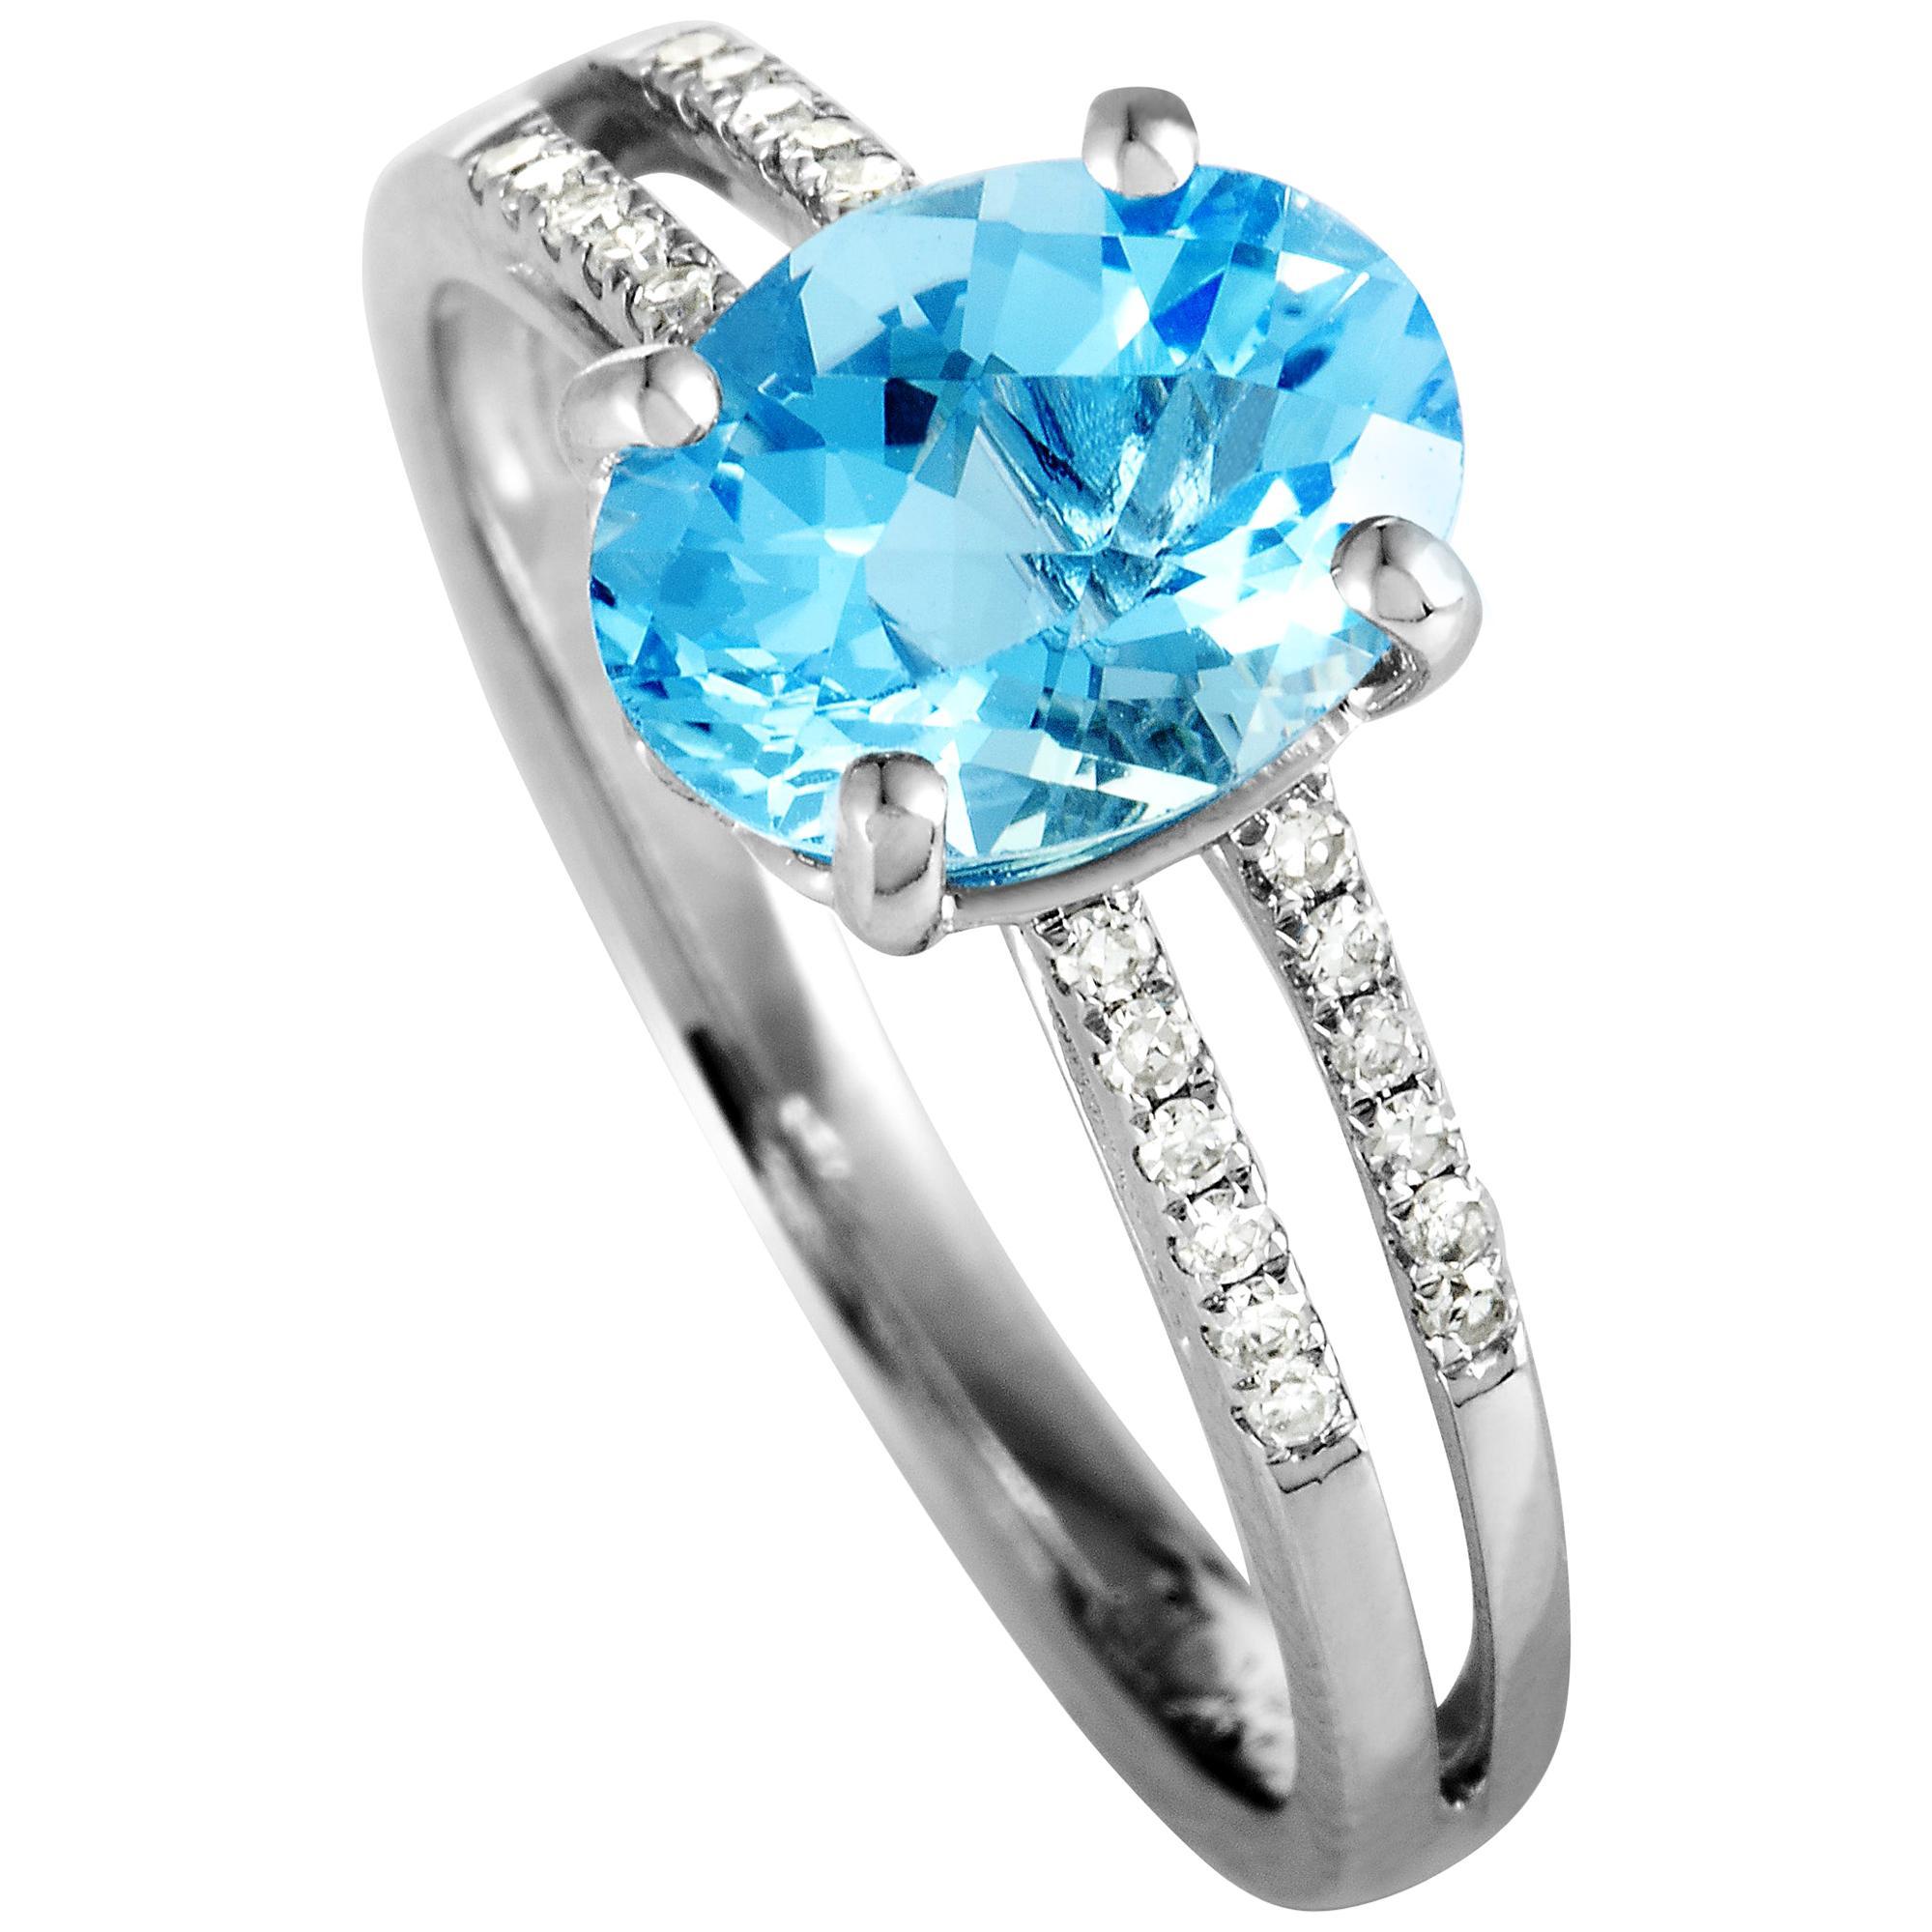 14 Karat White Gold Diamonds and Oval Topaz Ring